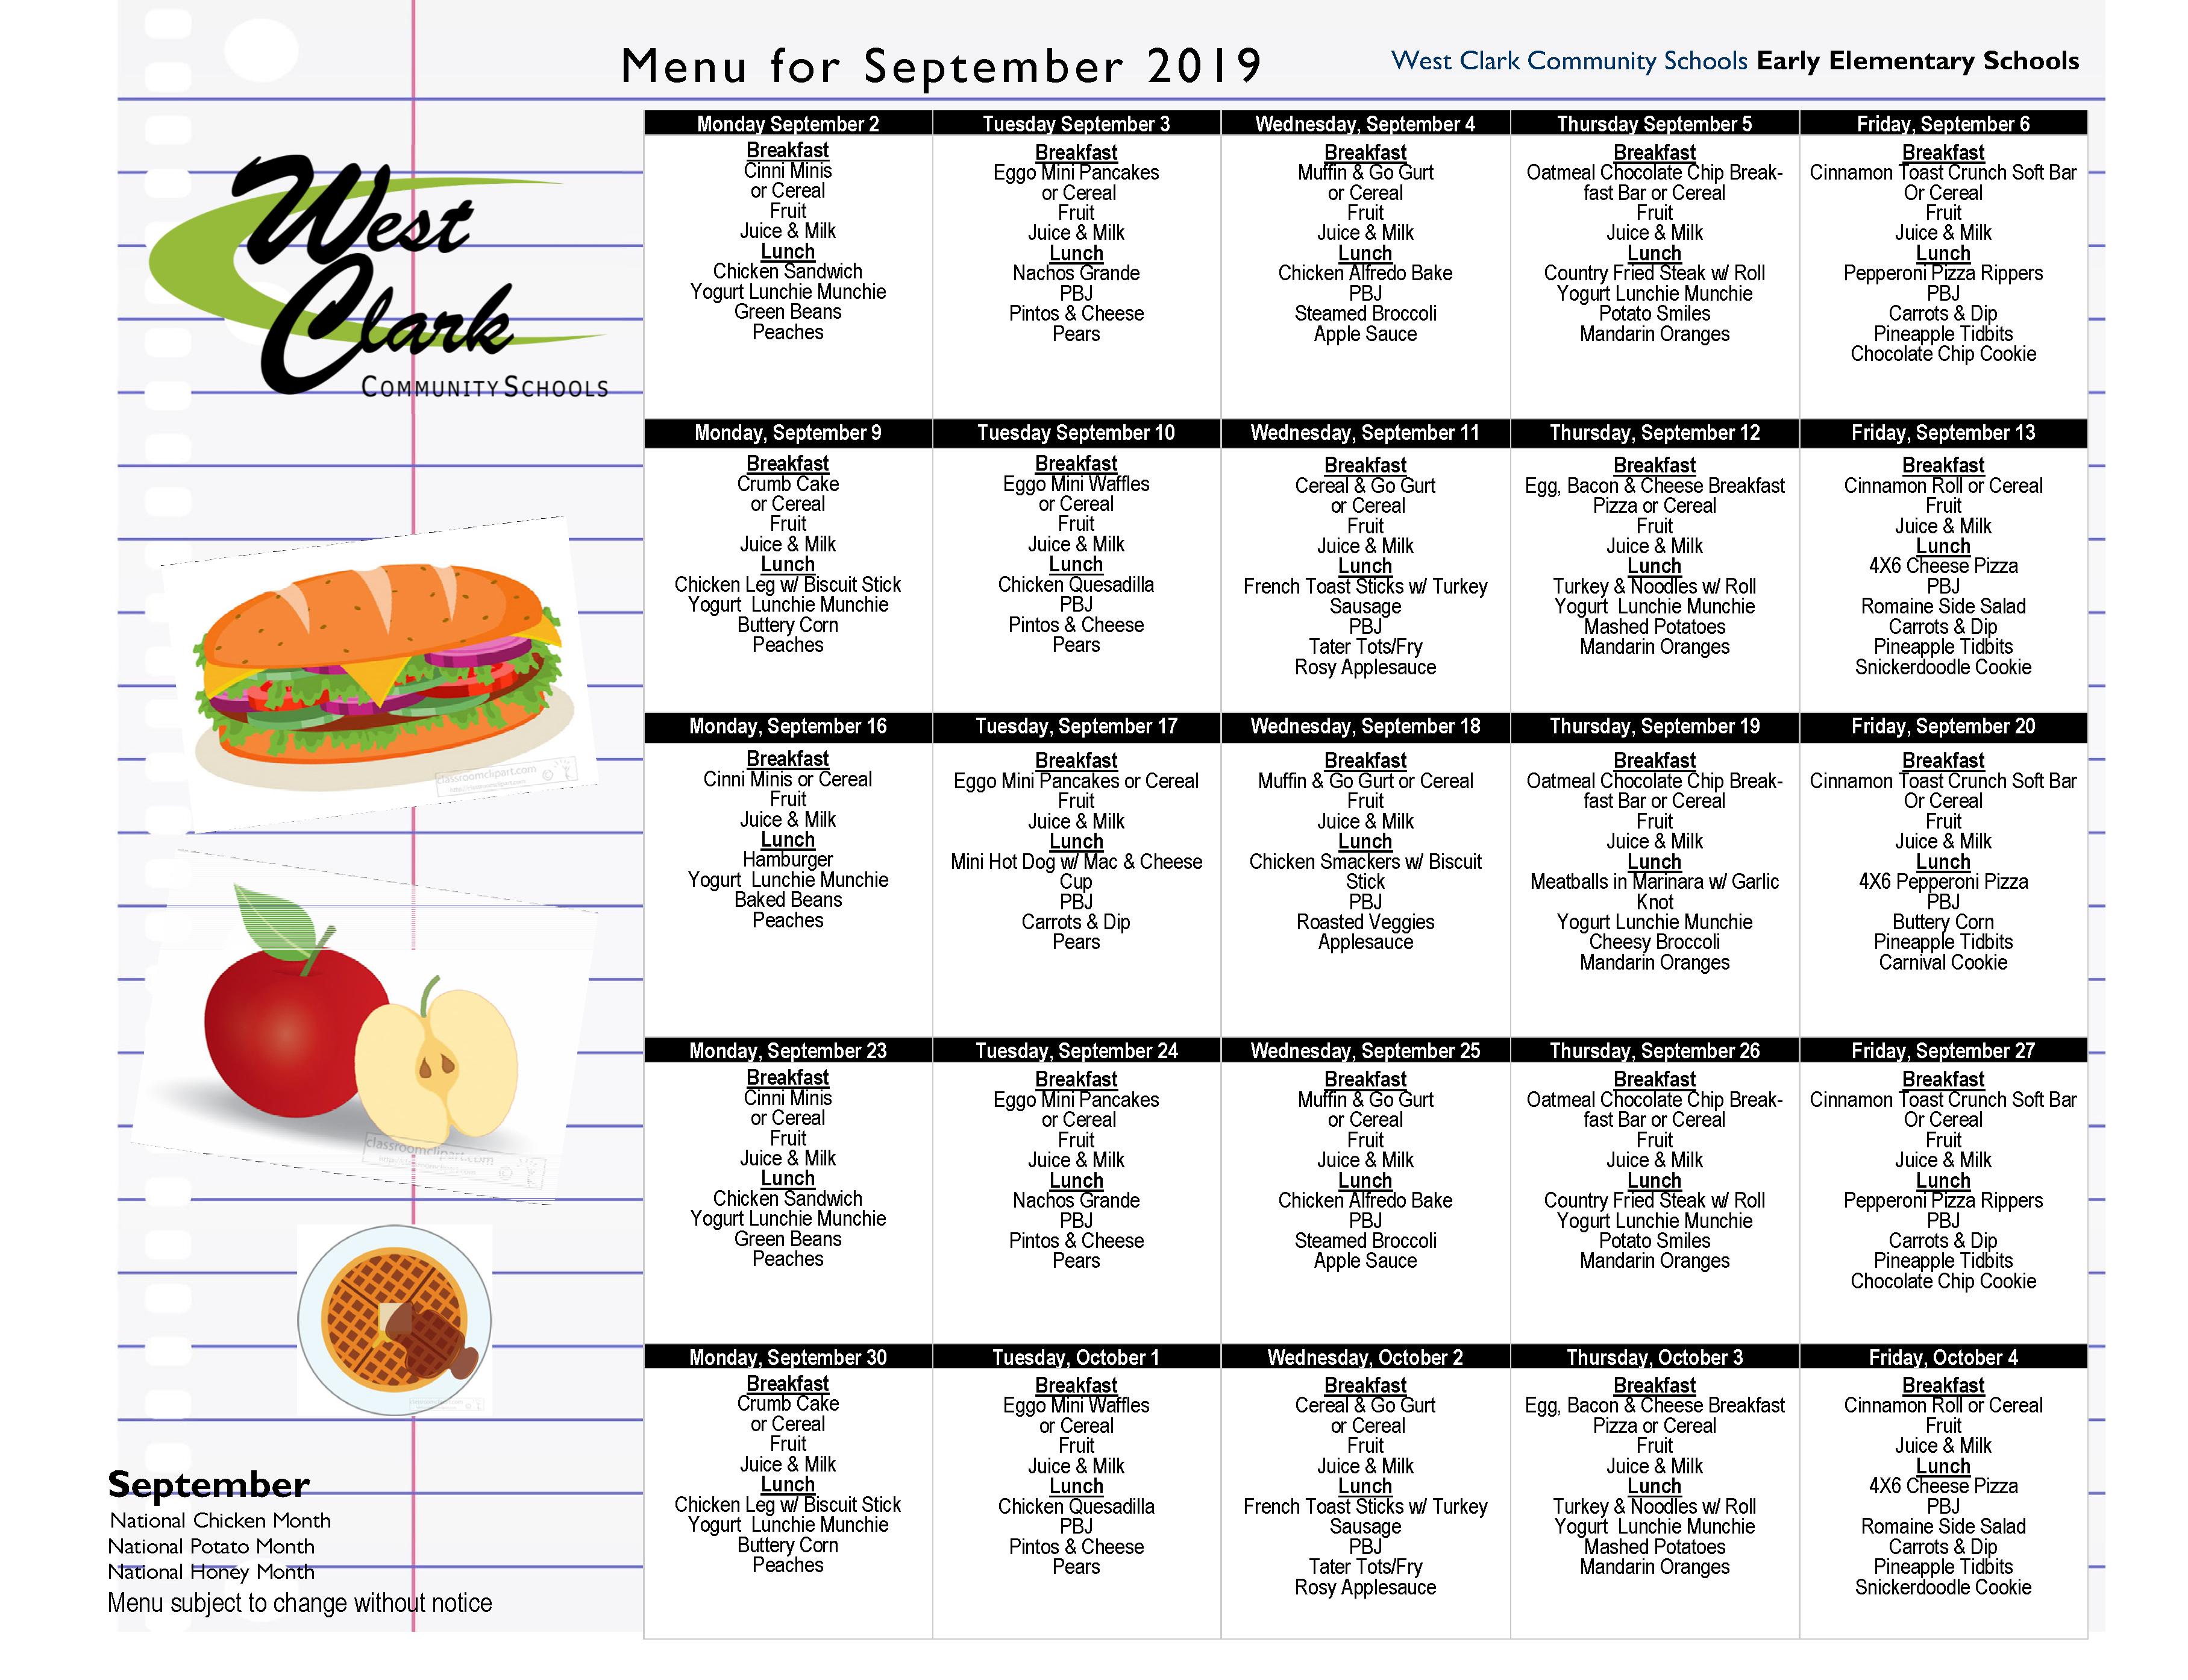 Food Menus – West Clark Community Schools intended for West Clark Community School Calendar